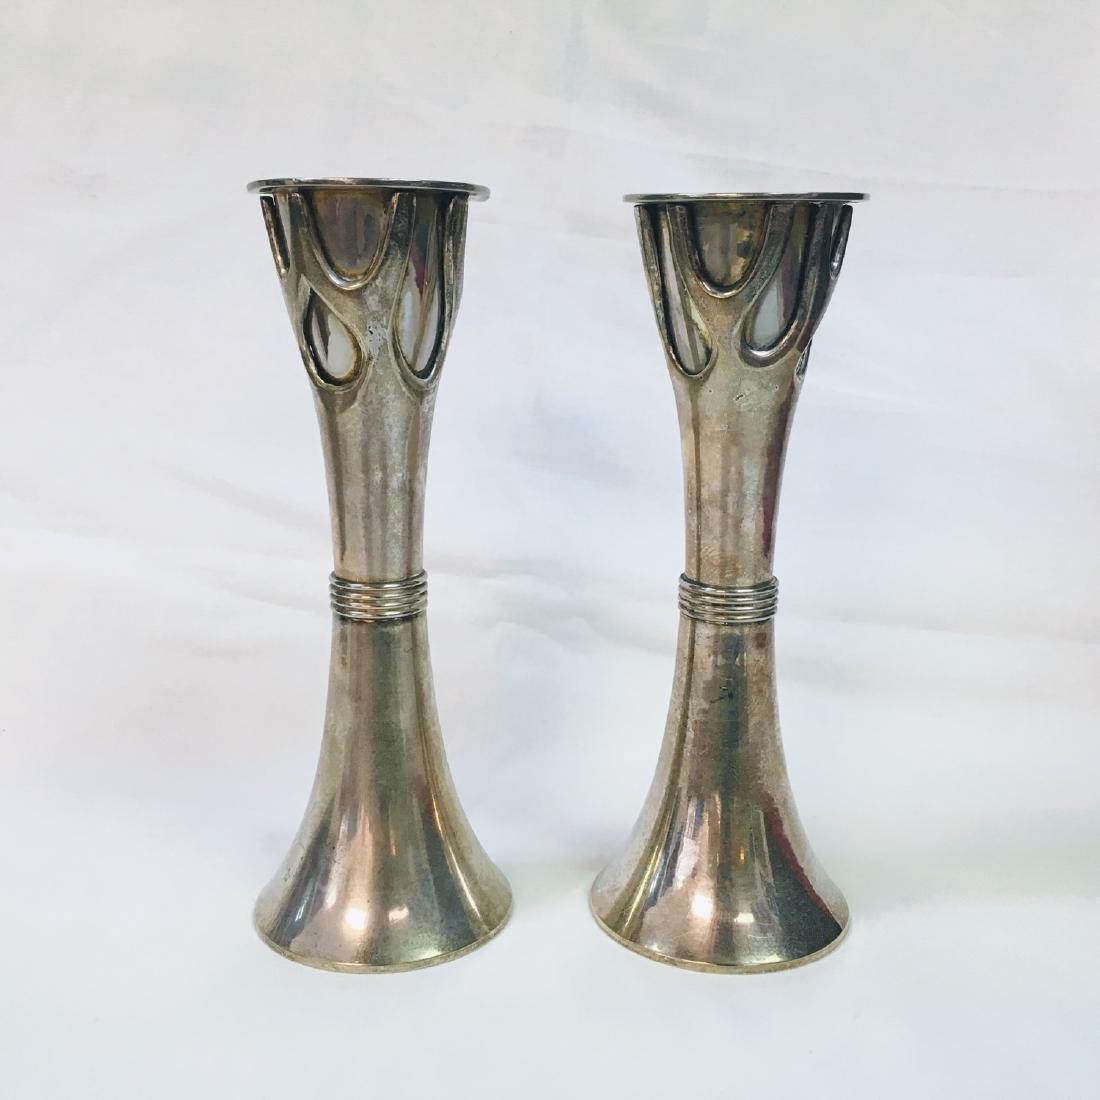 Jewish, Shabbat Candle Holders / Sticks, Classic,